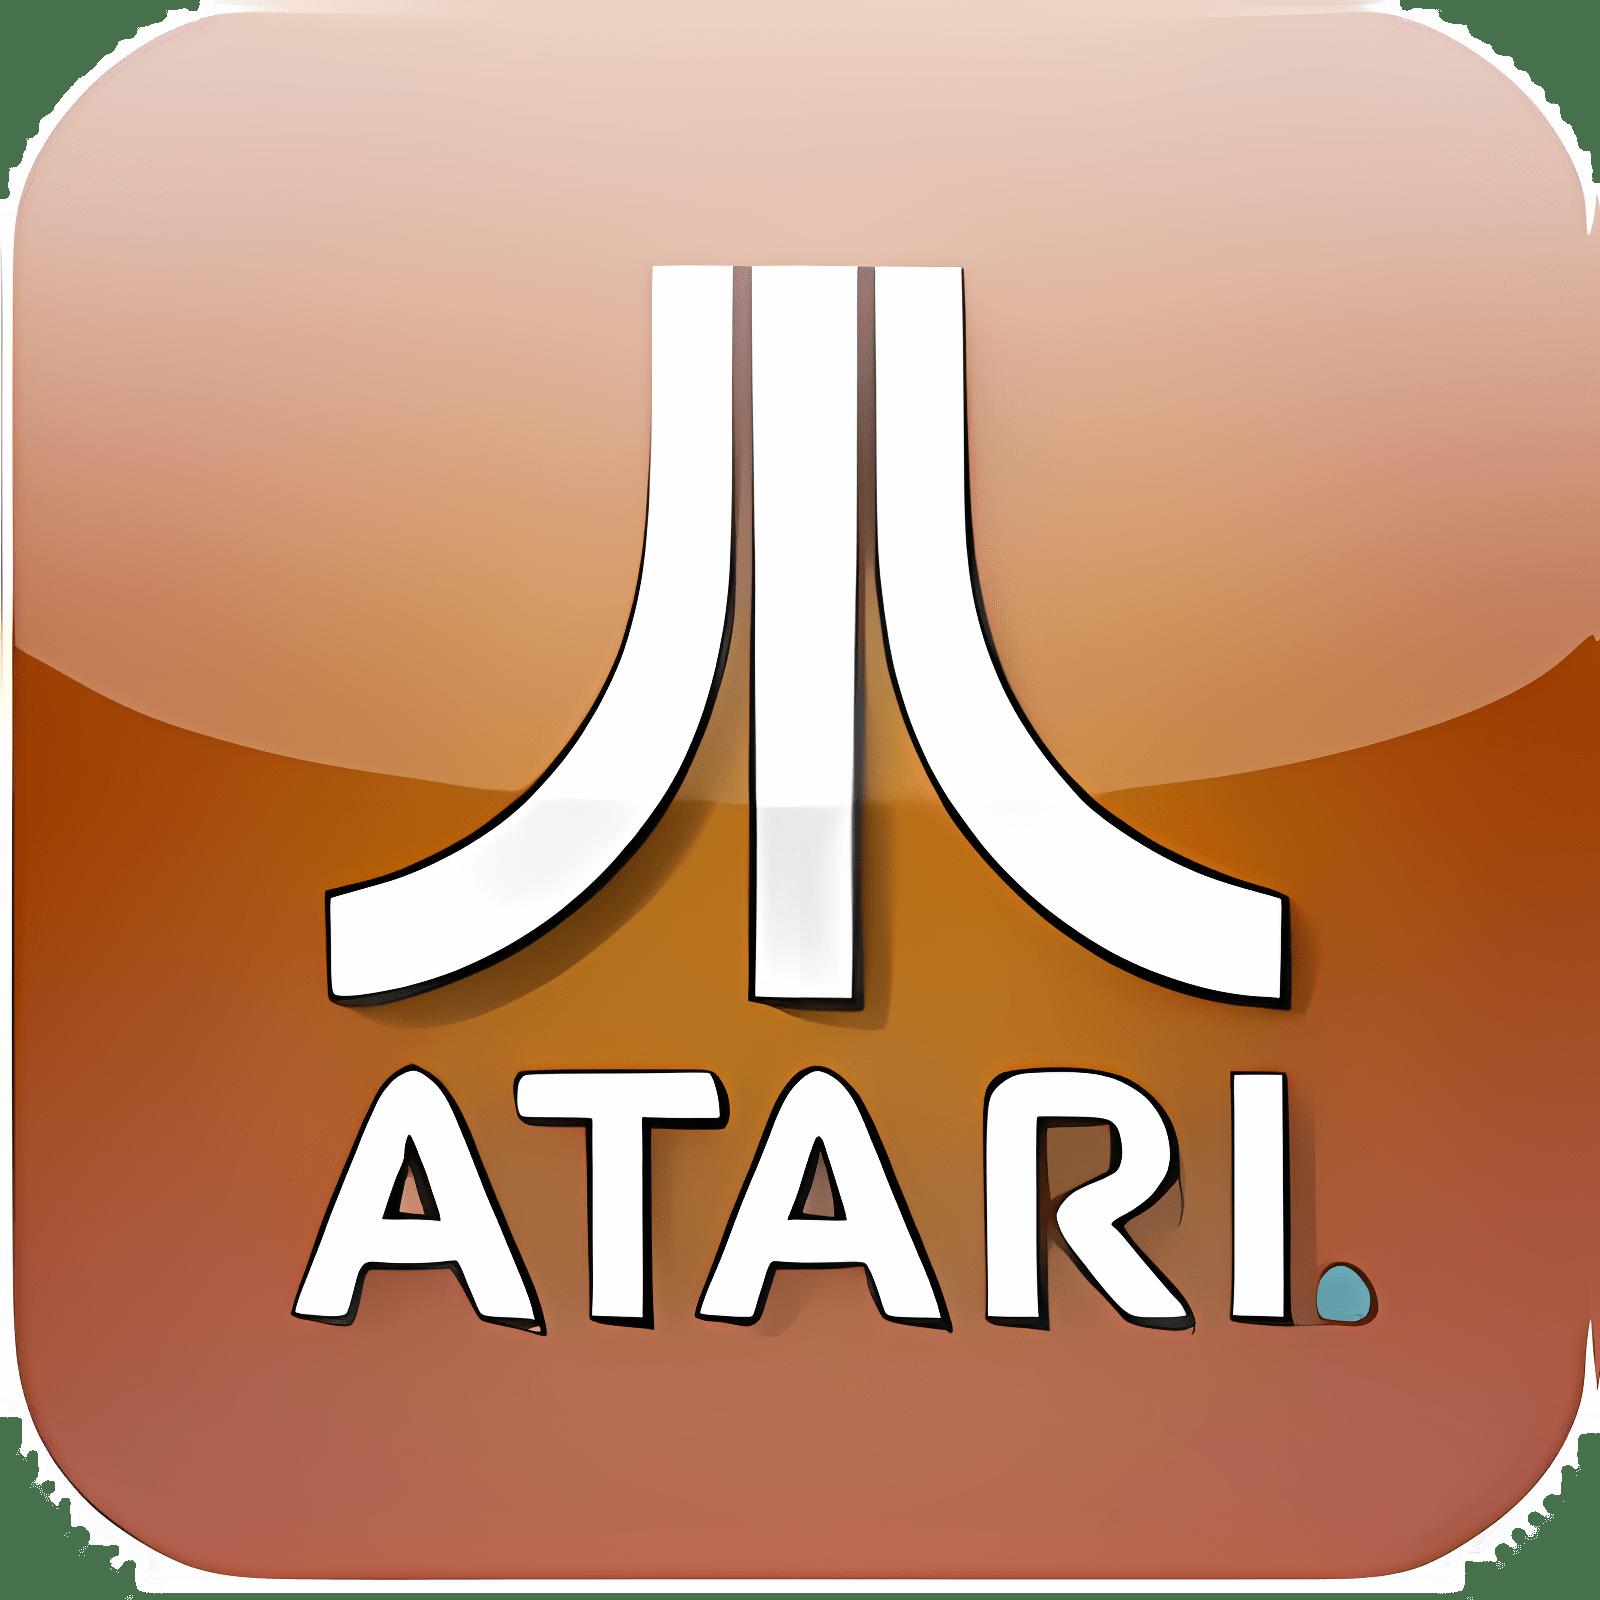 Atari's Greatest Hits